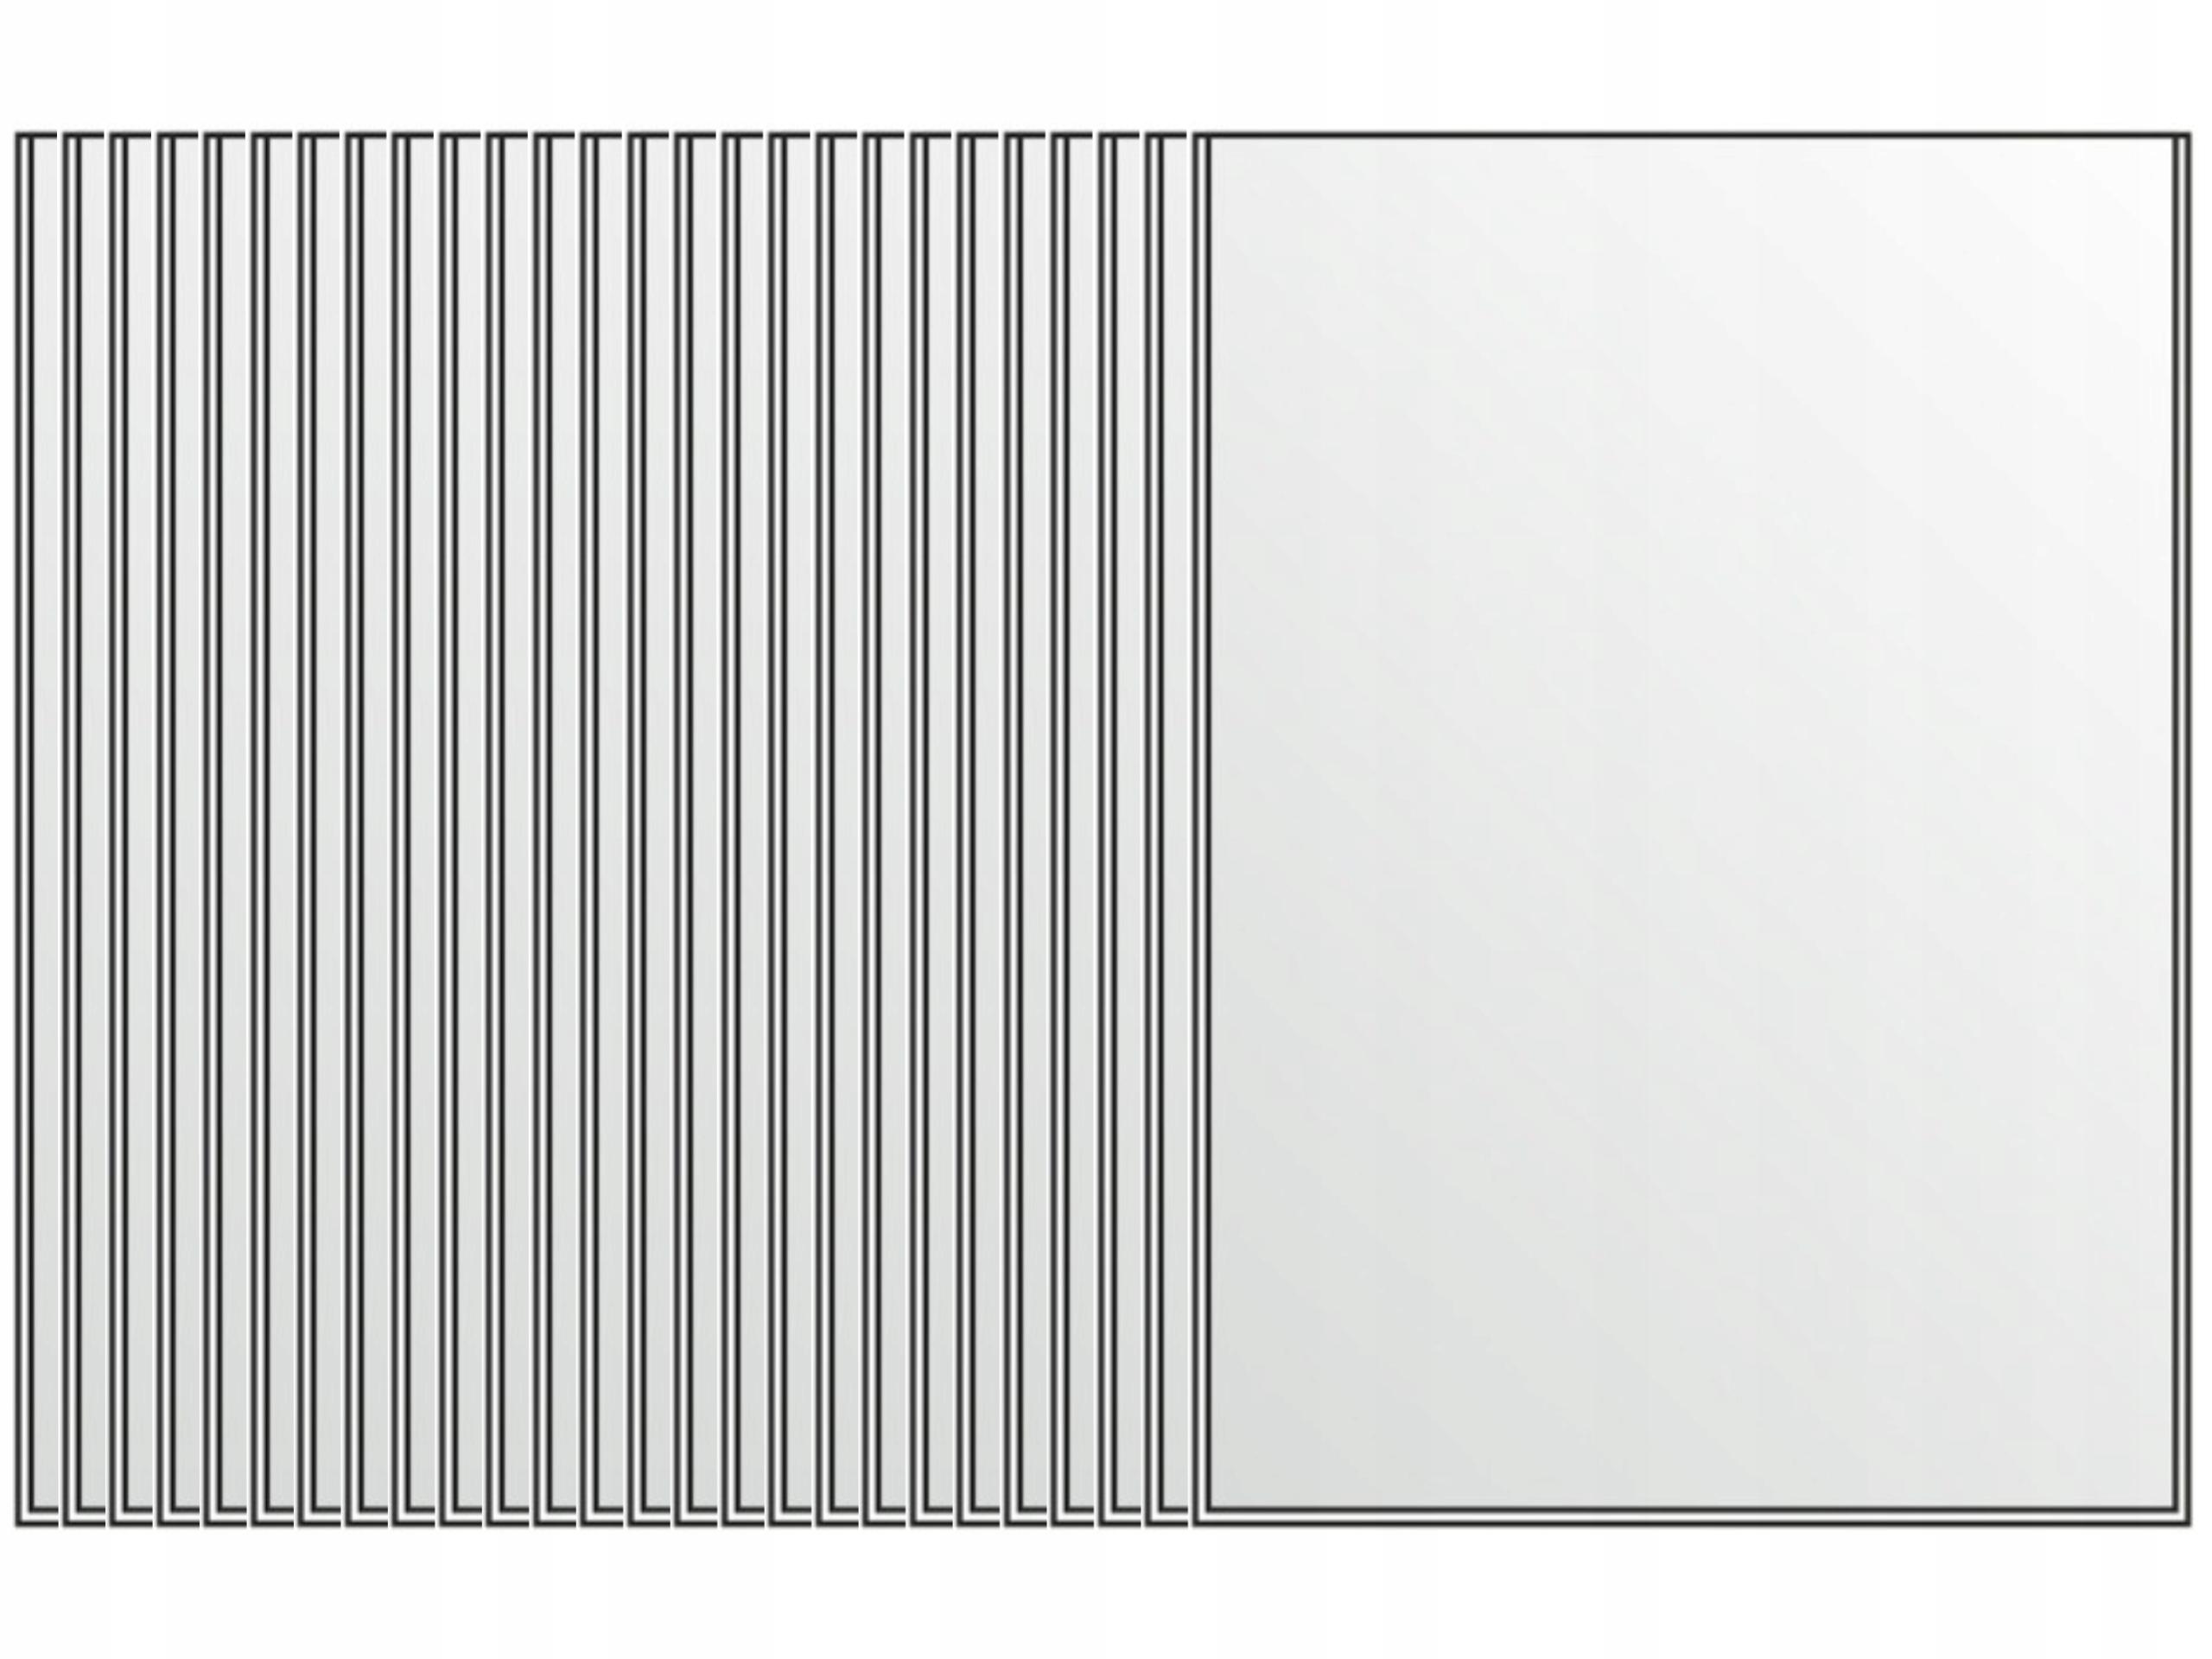 Item Ofertówka hard for documents PVC A4 From 150µ 25pcs